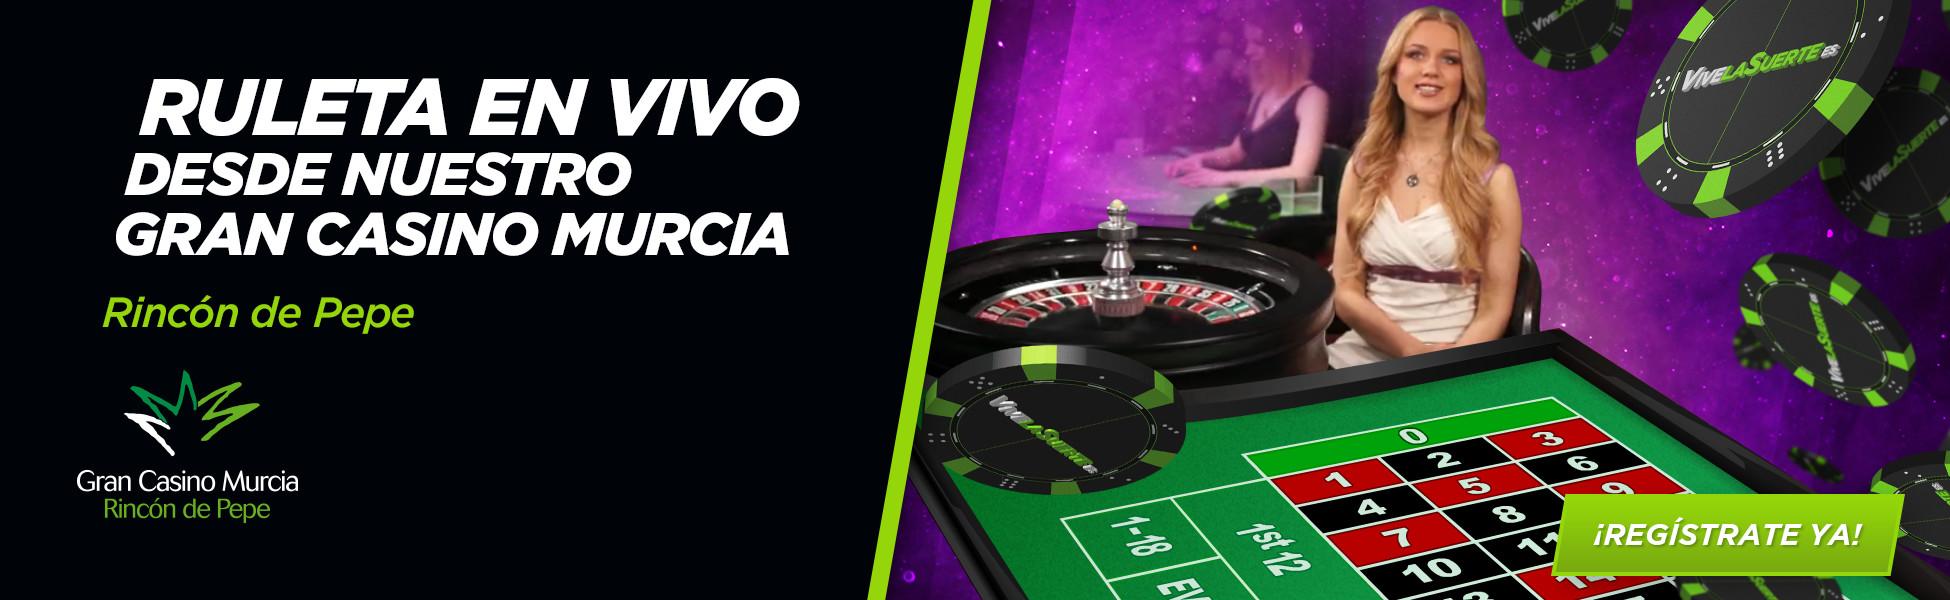 5 TIRADAS gratis casino Portugal ruleta online 172908